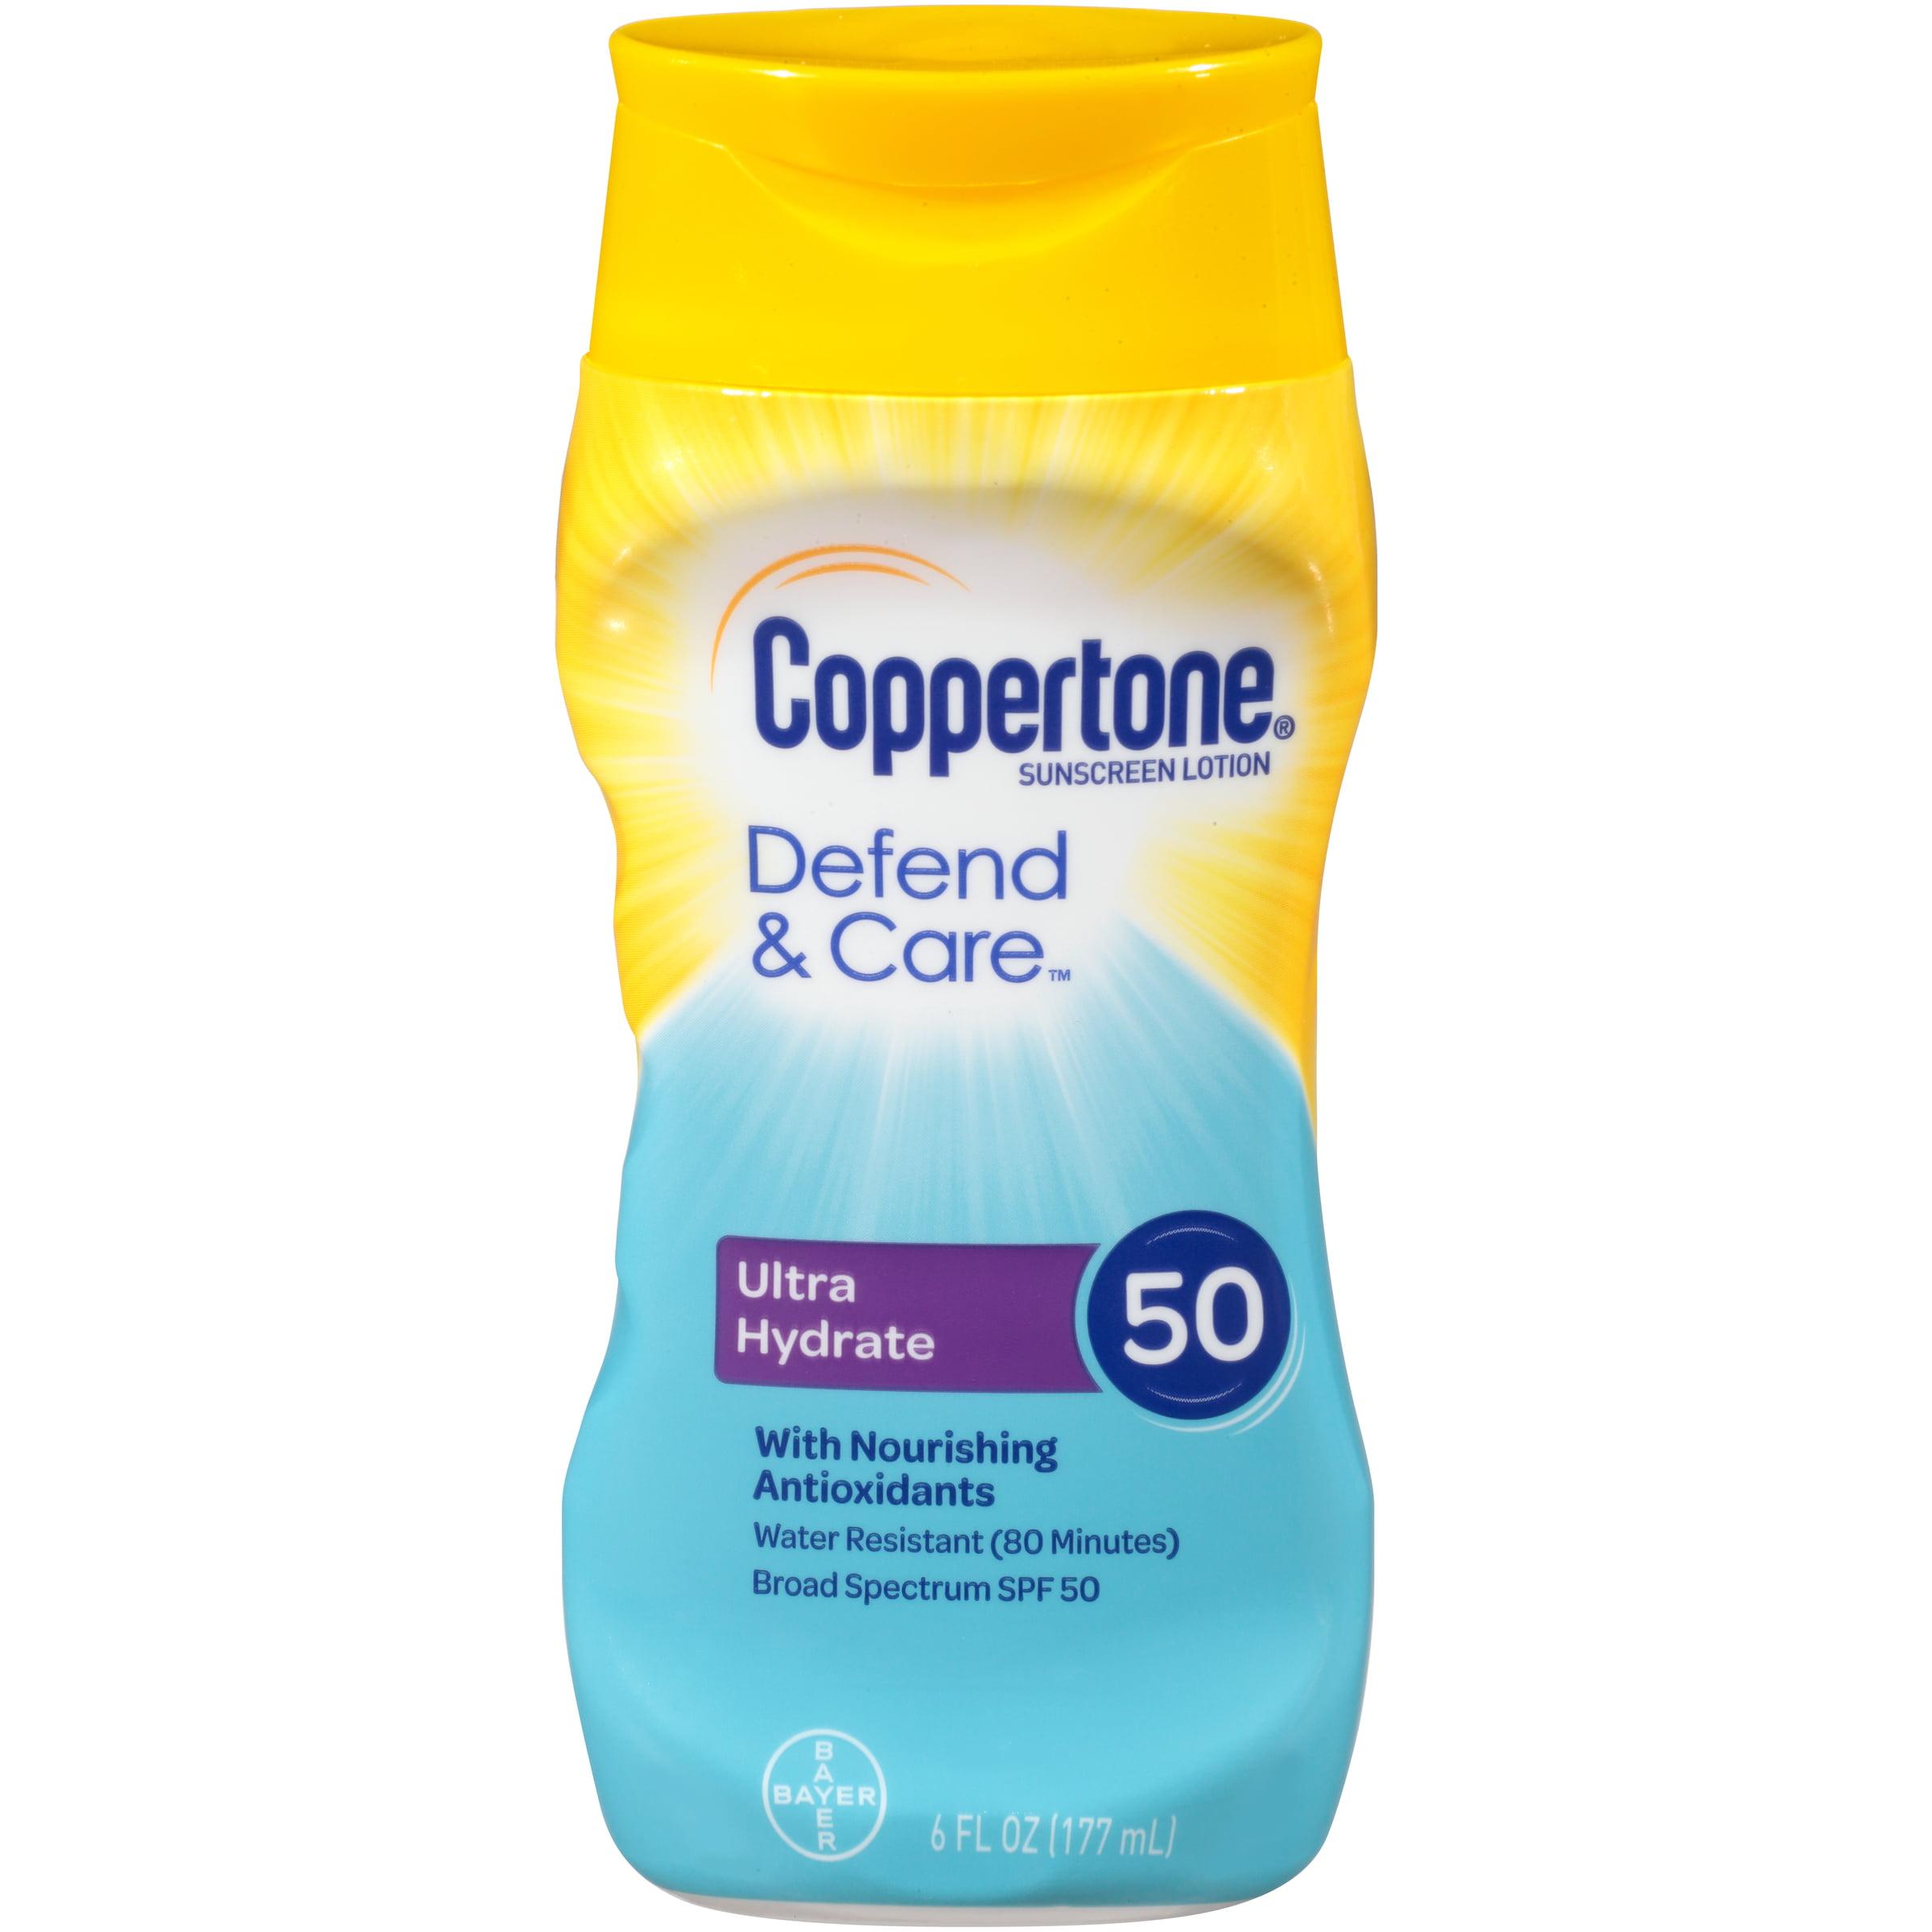 Coppertone Defend & Care Ultra Hydrate Sunscreen Lotion SPF 50 6 oz